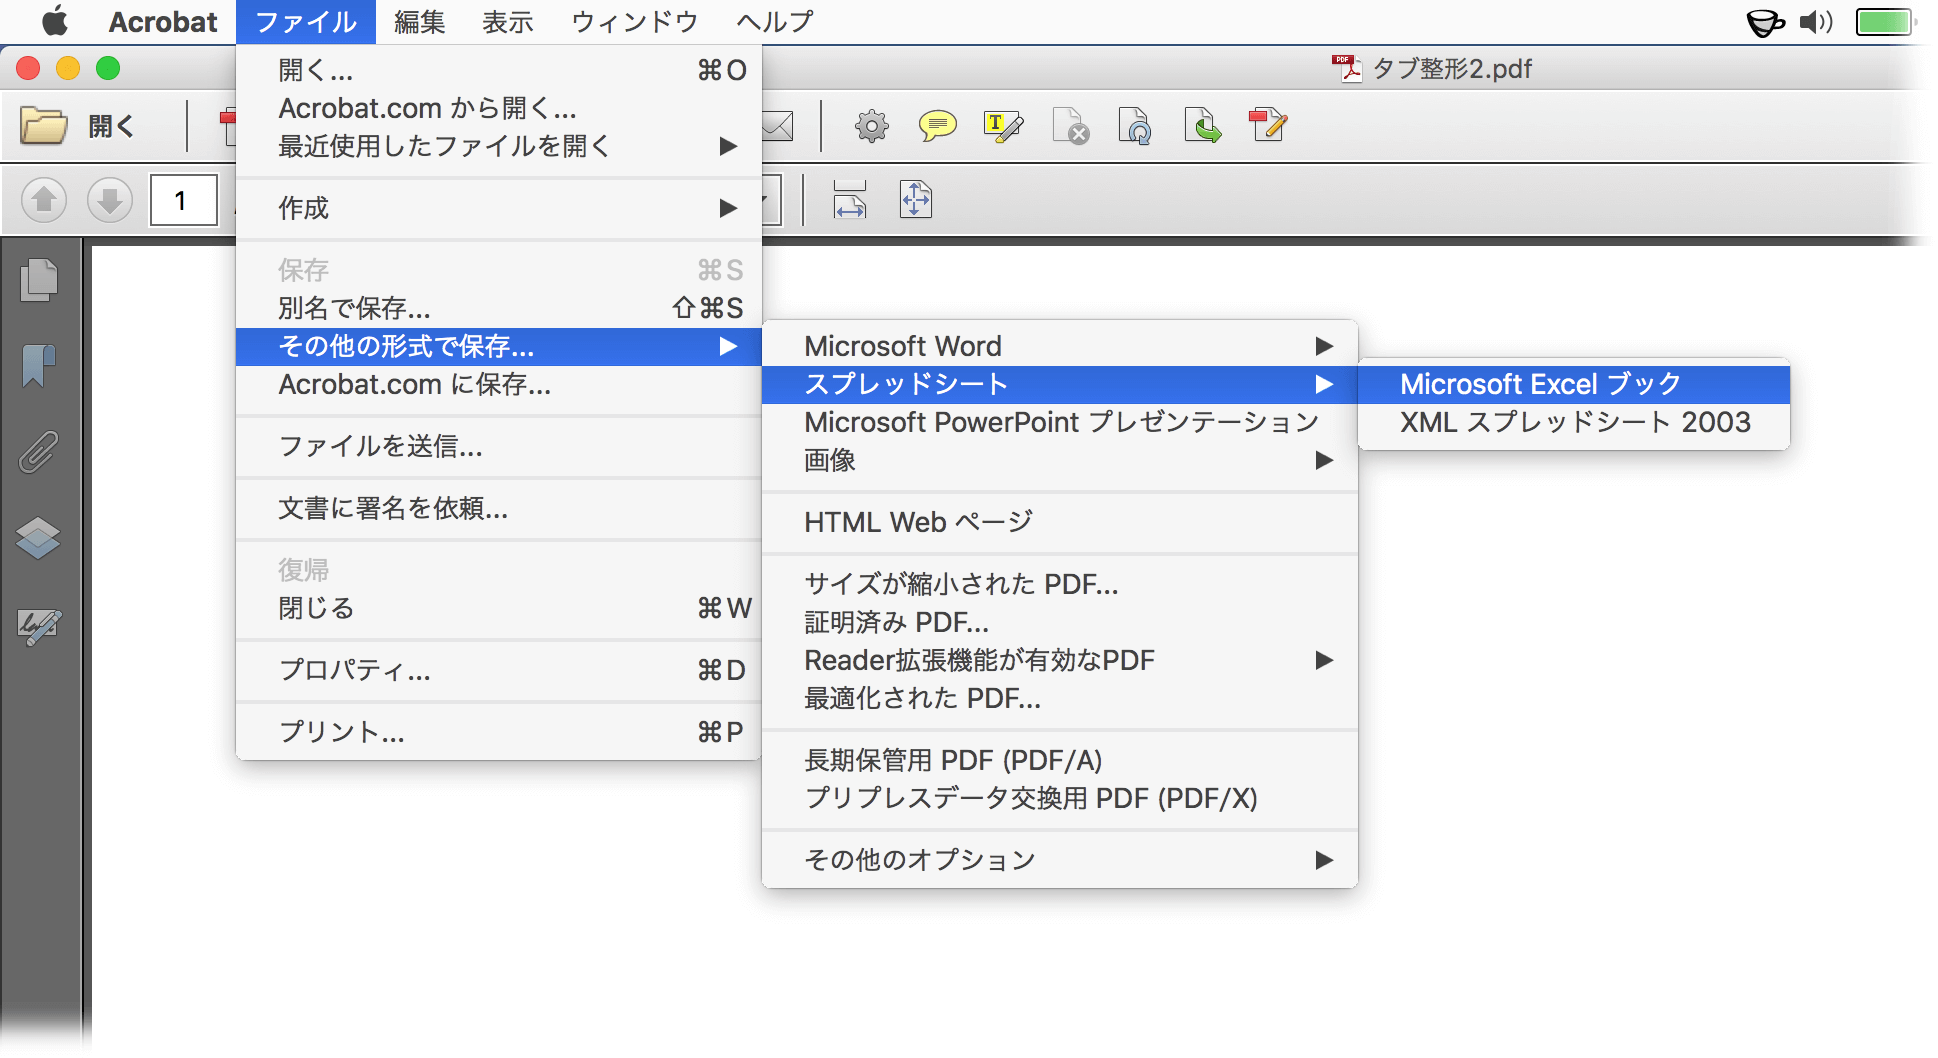 pdf を エクセル に 戻す